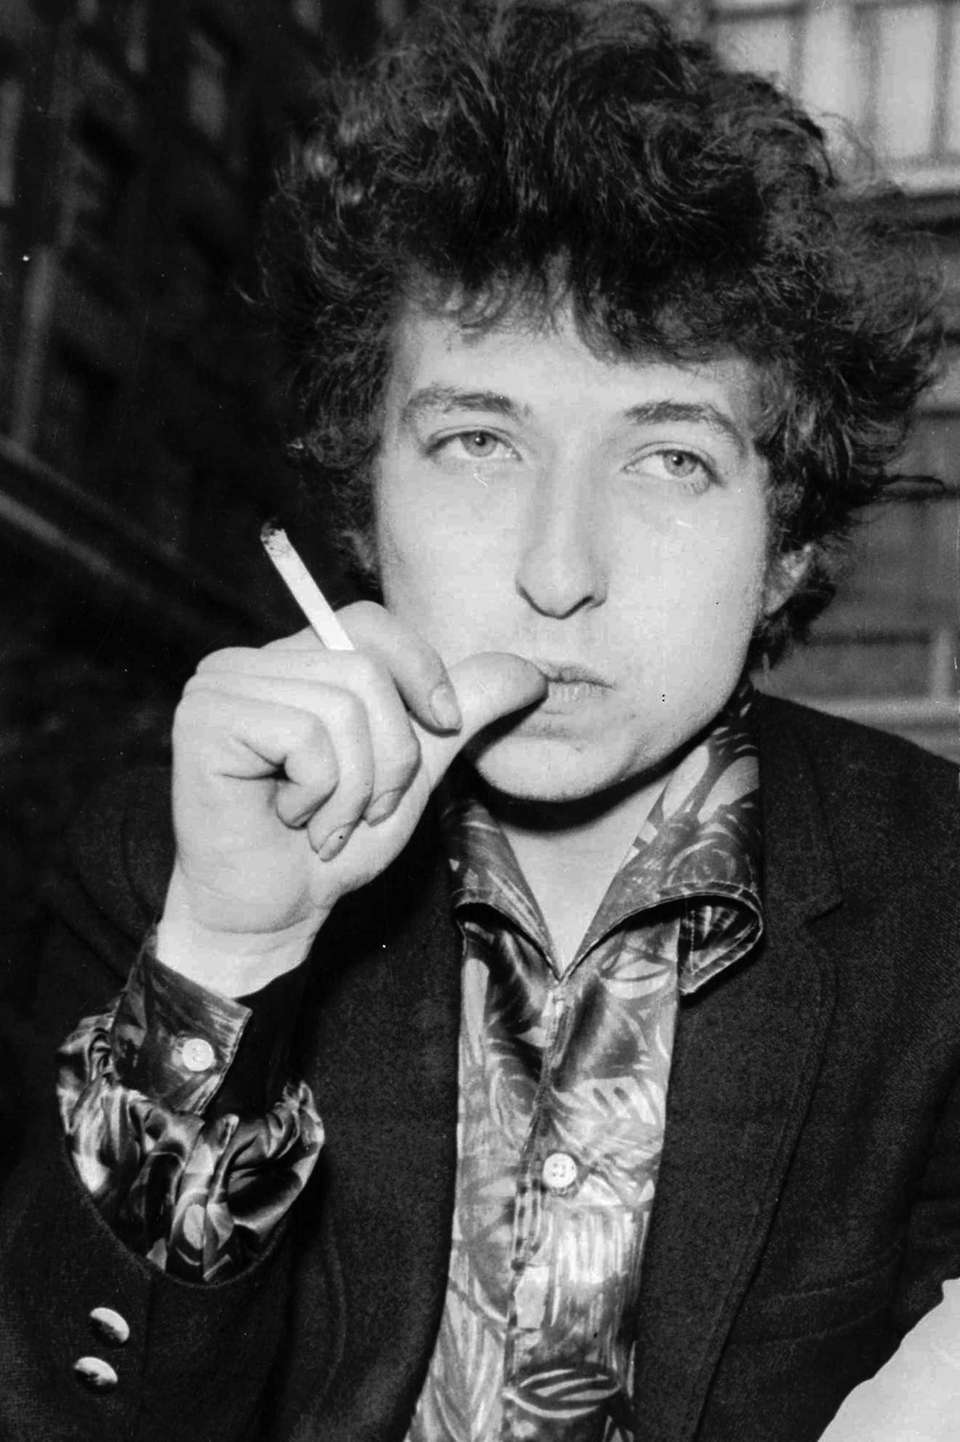 Singer-songwriter Bob Dylan in London on April 27,